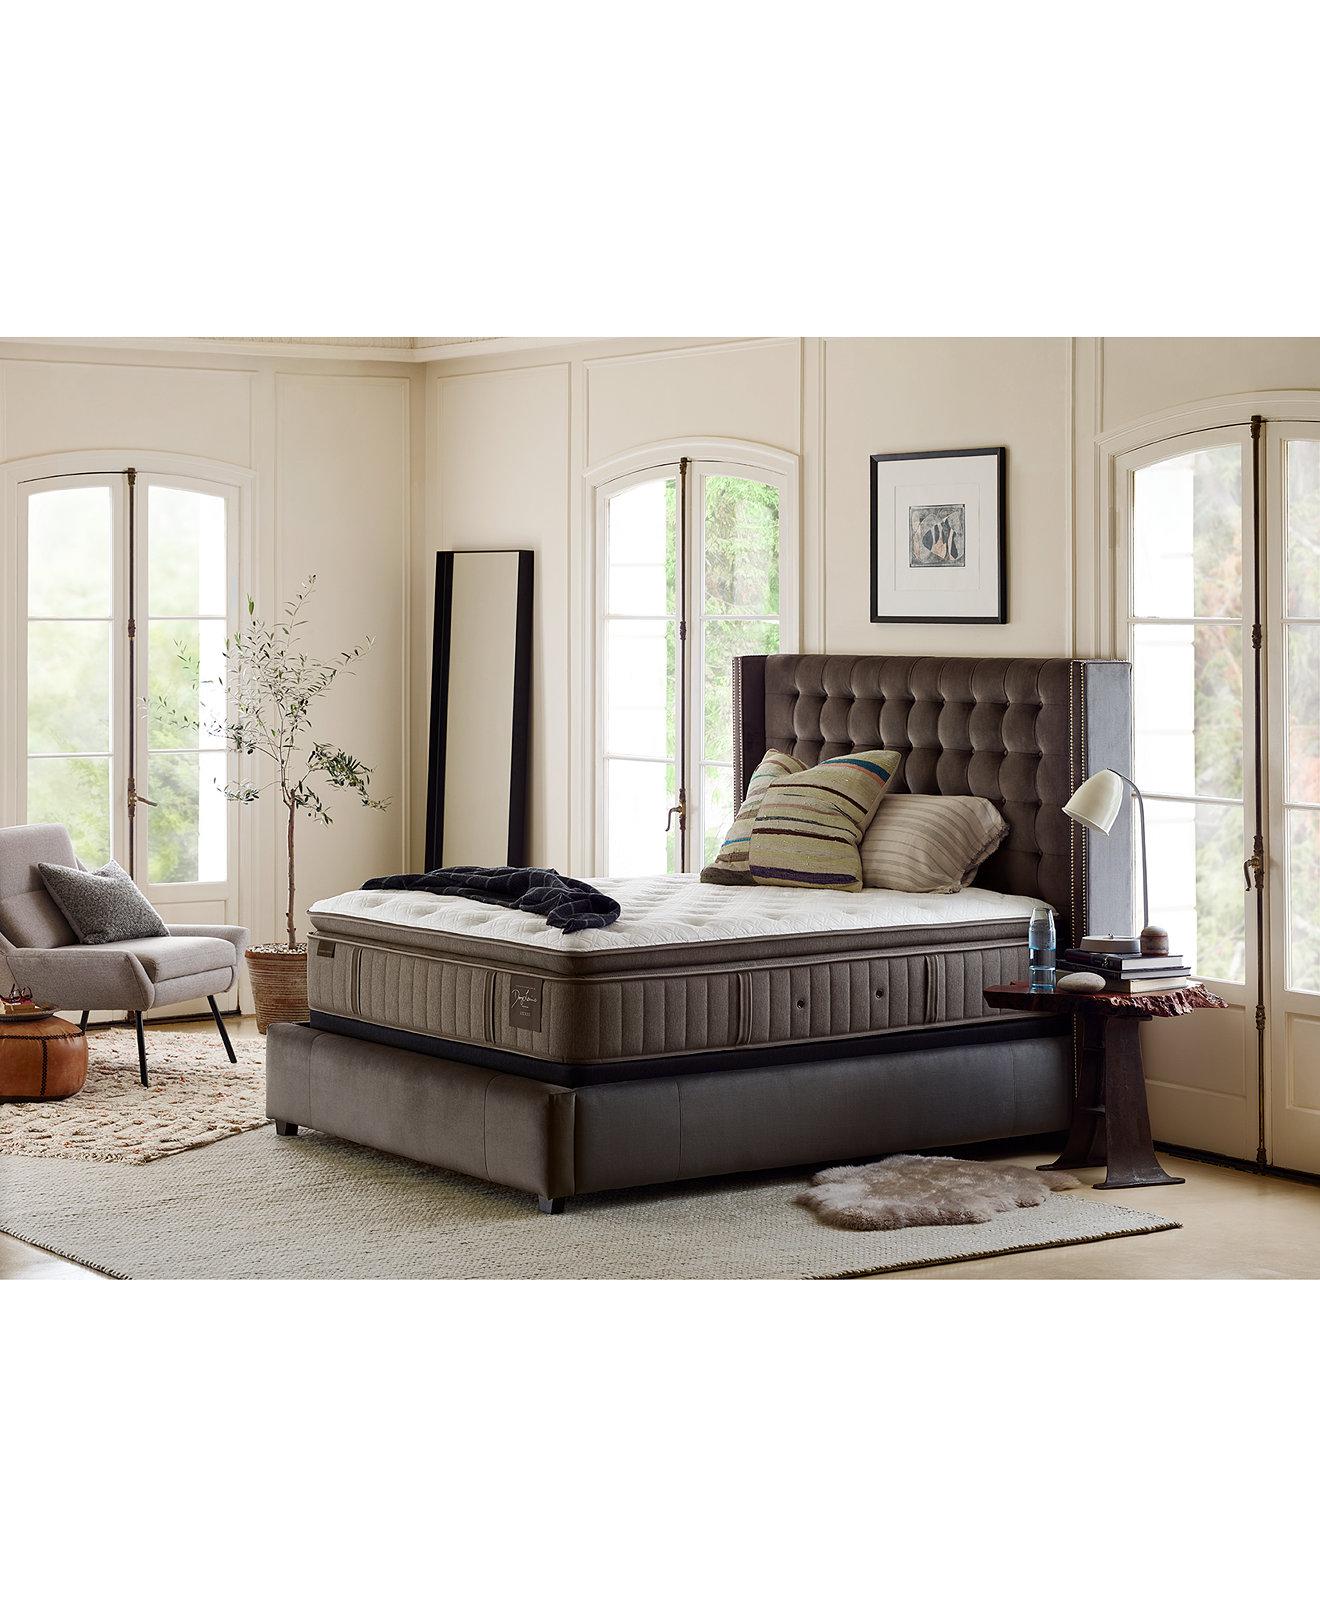 "Stearns & Foster Estate Palace 15.5"" Luxury Plush Euro Pillowtop Mattress  Sets"